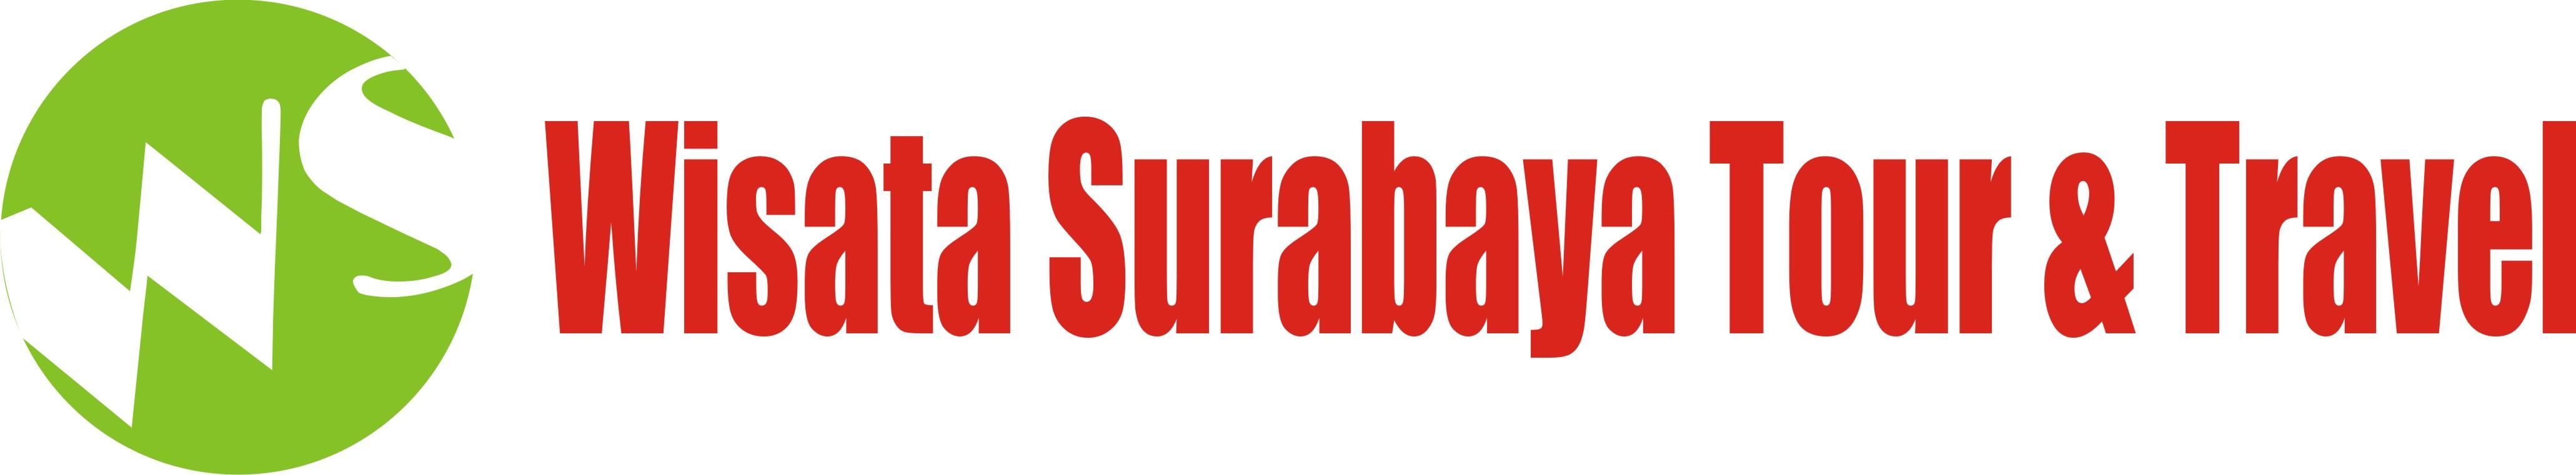 Wisata Surabaya | WS Tour Travel